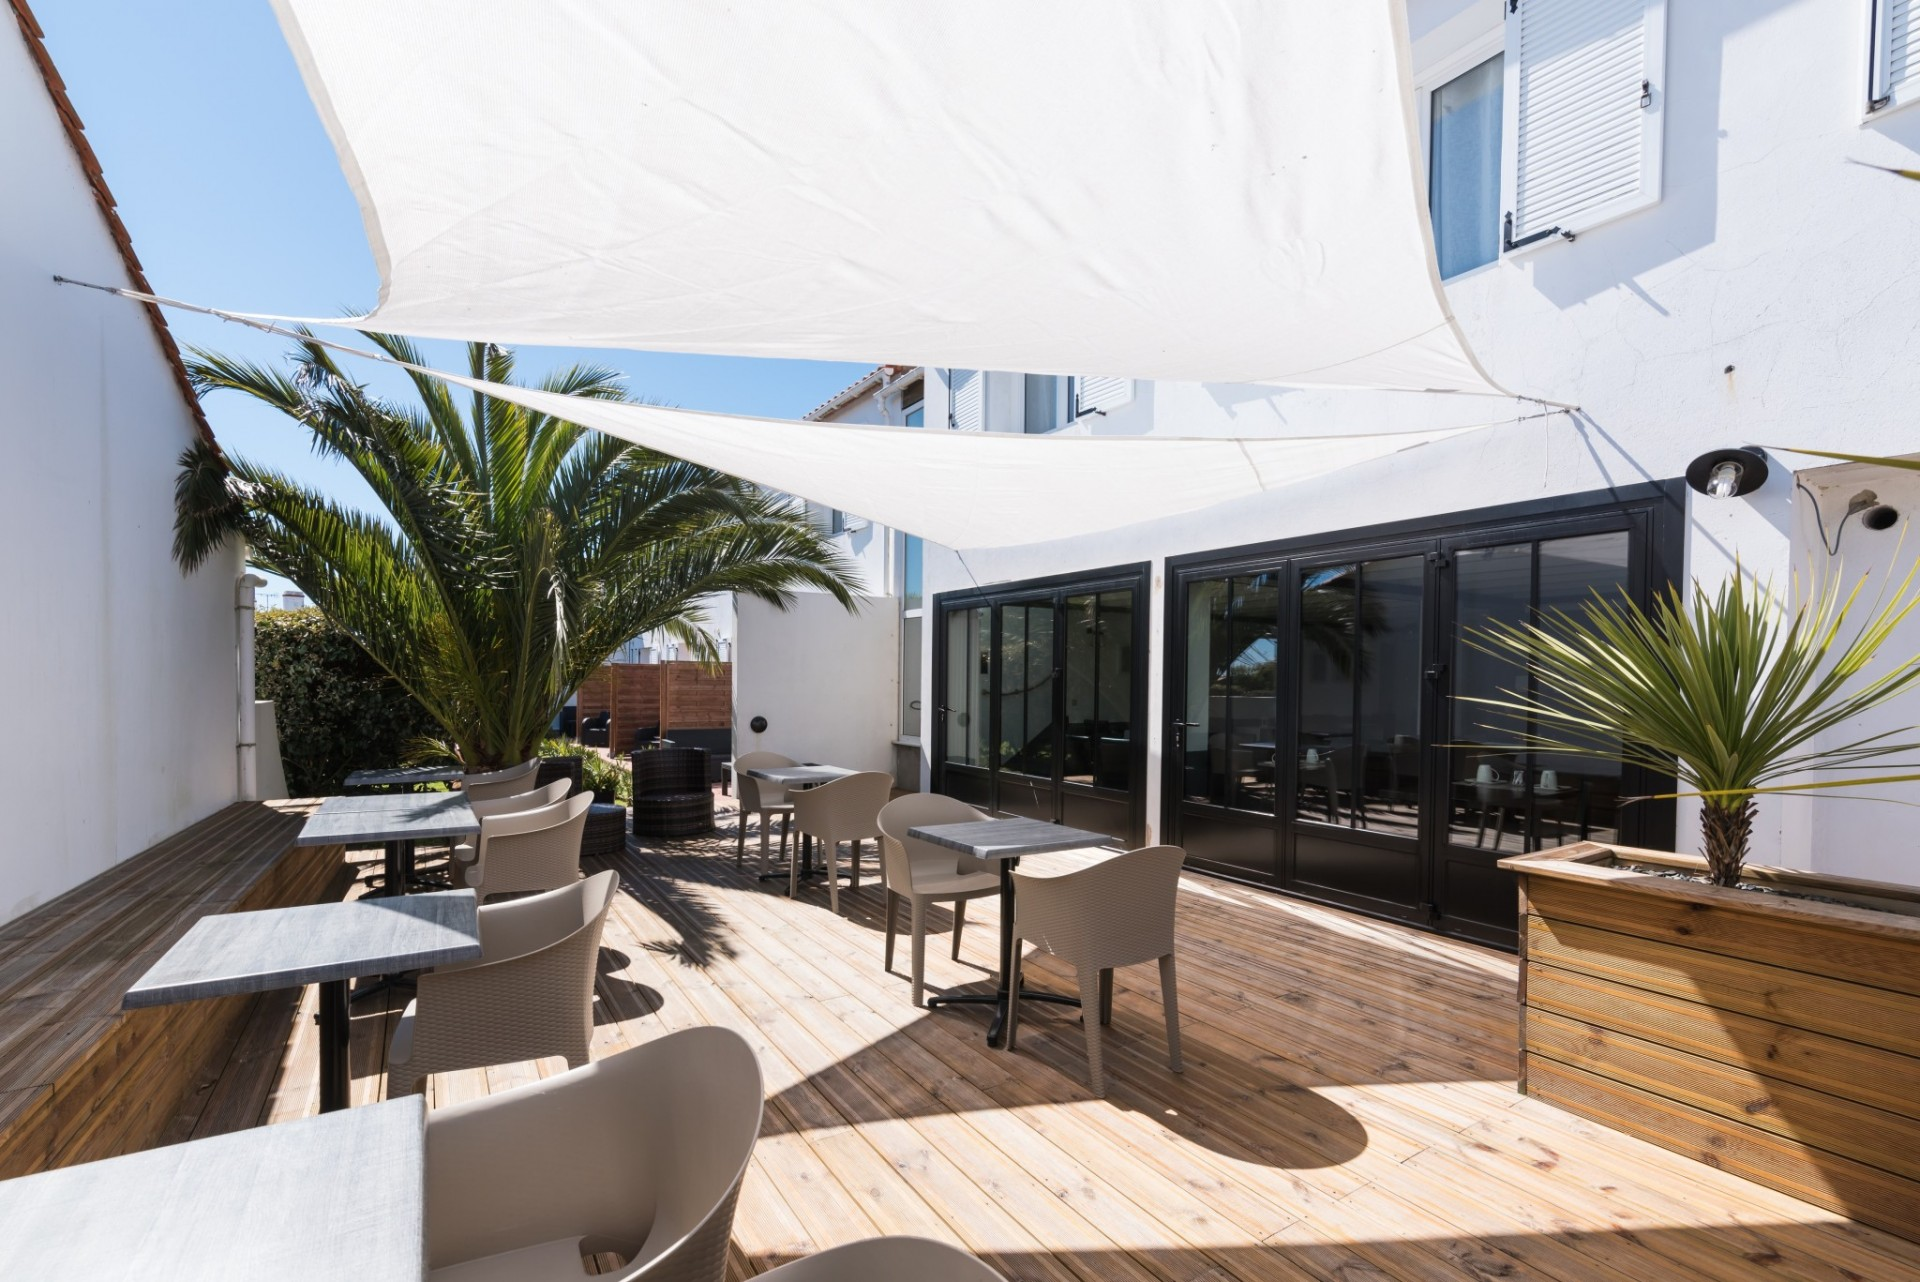 H tel ancre marine spa thalgo h tel 3 toiles noirmoutier - Hotel noirmoutier en ile ...